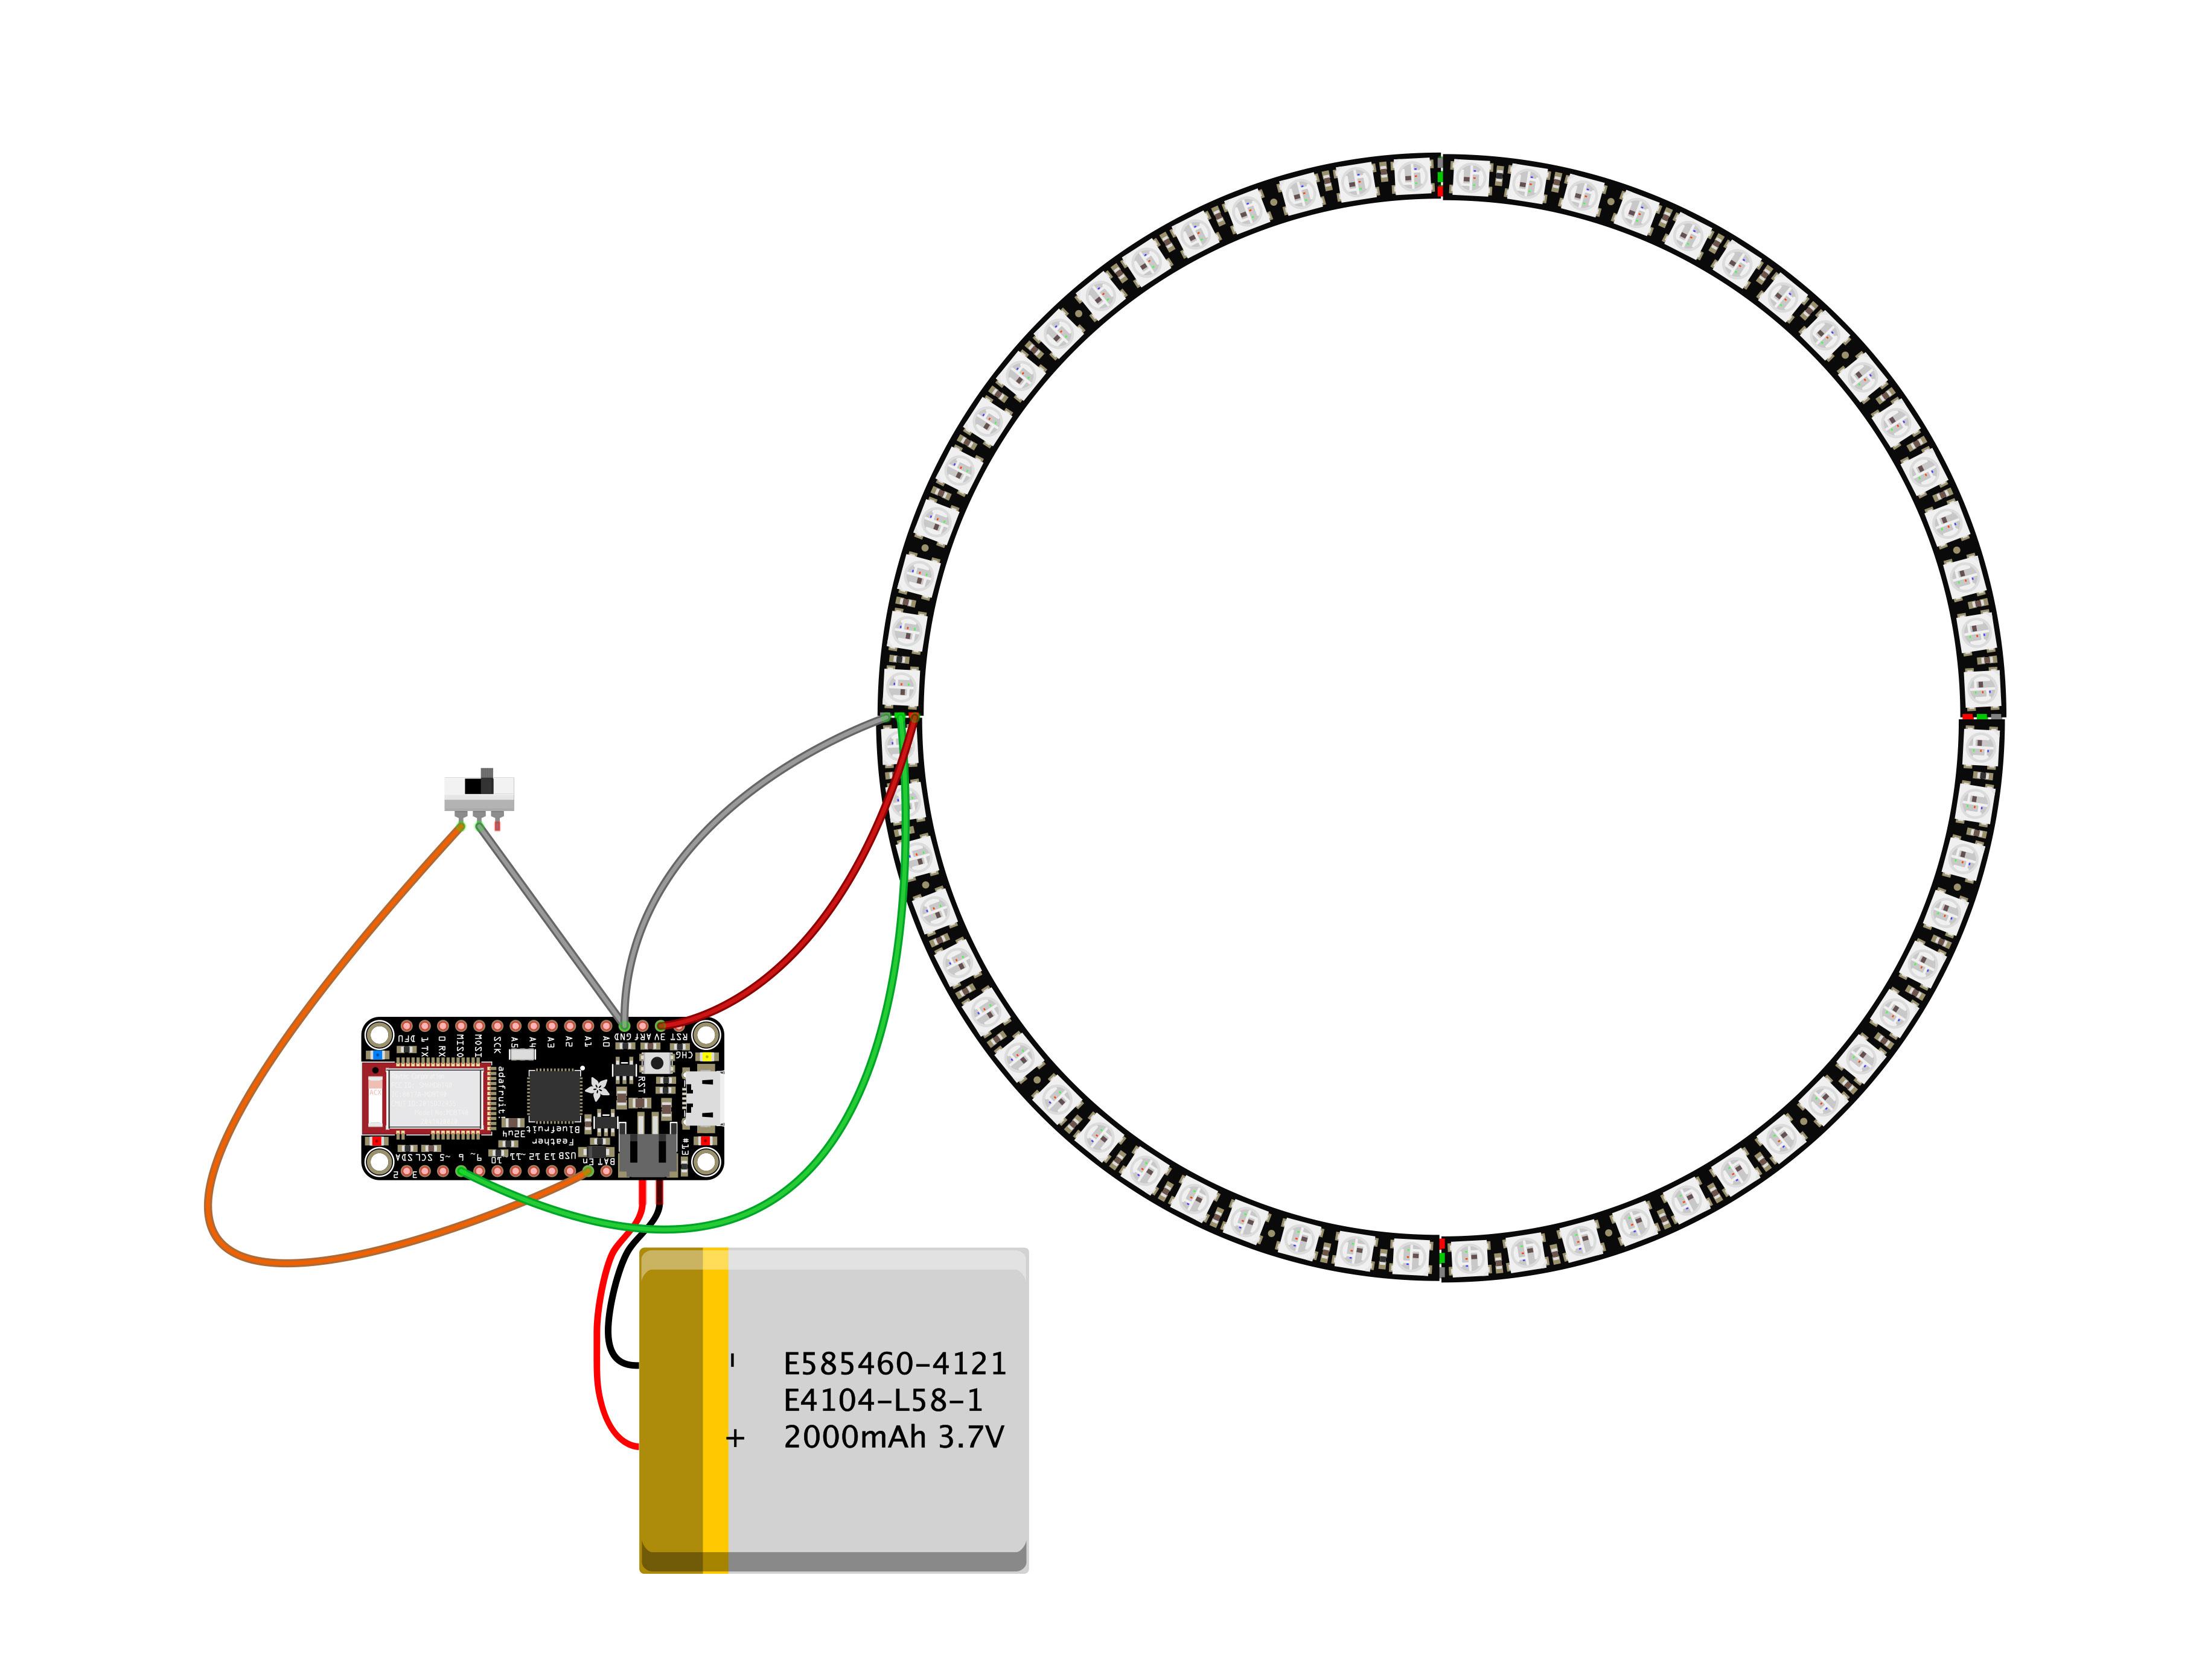 leds_circuit-diagram-stool.jpg